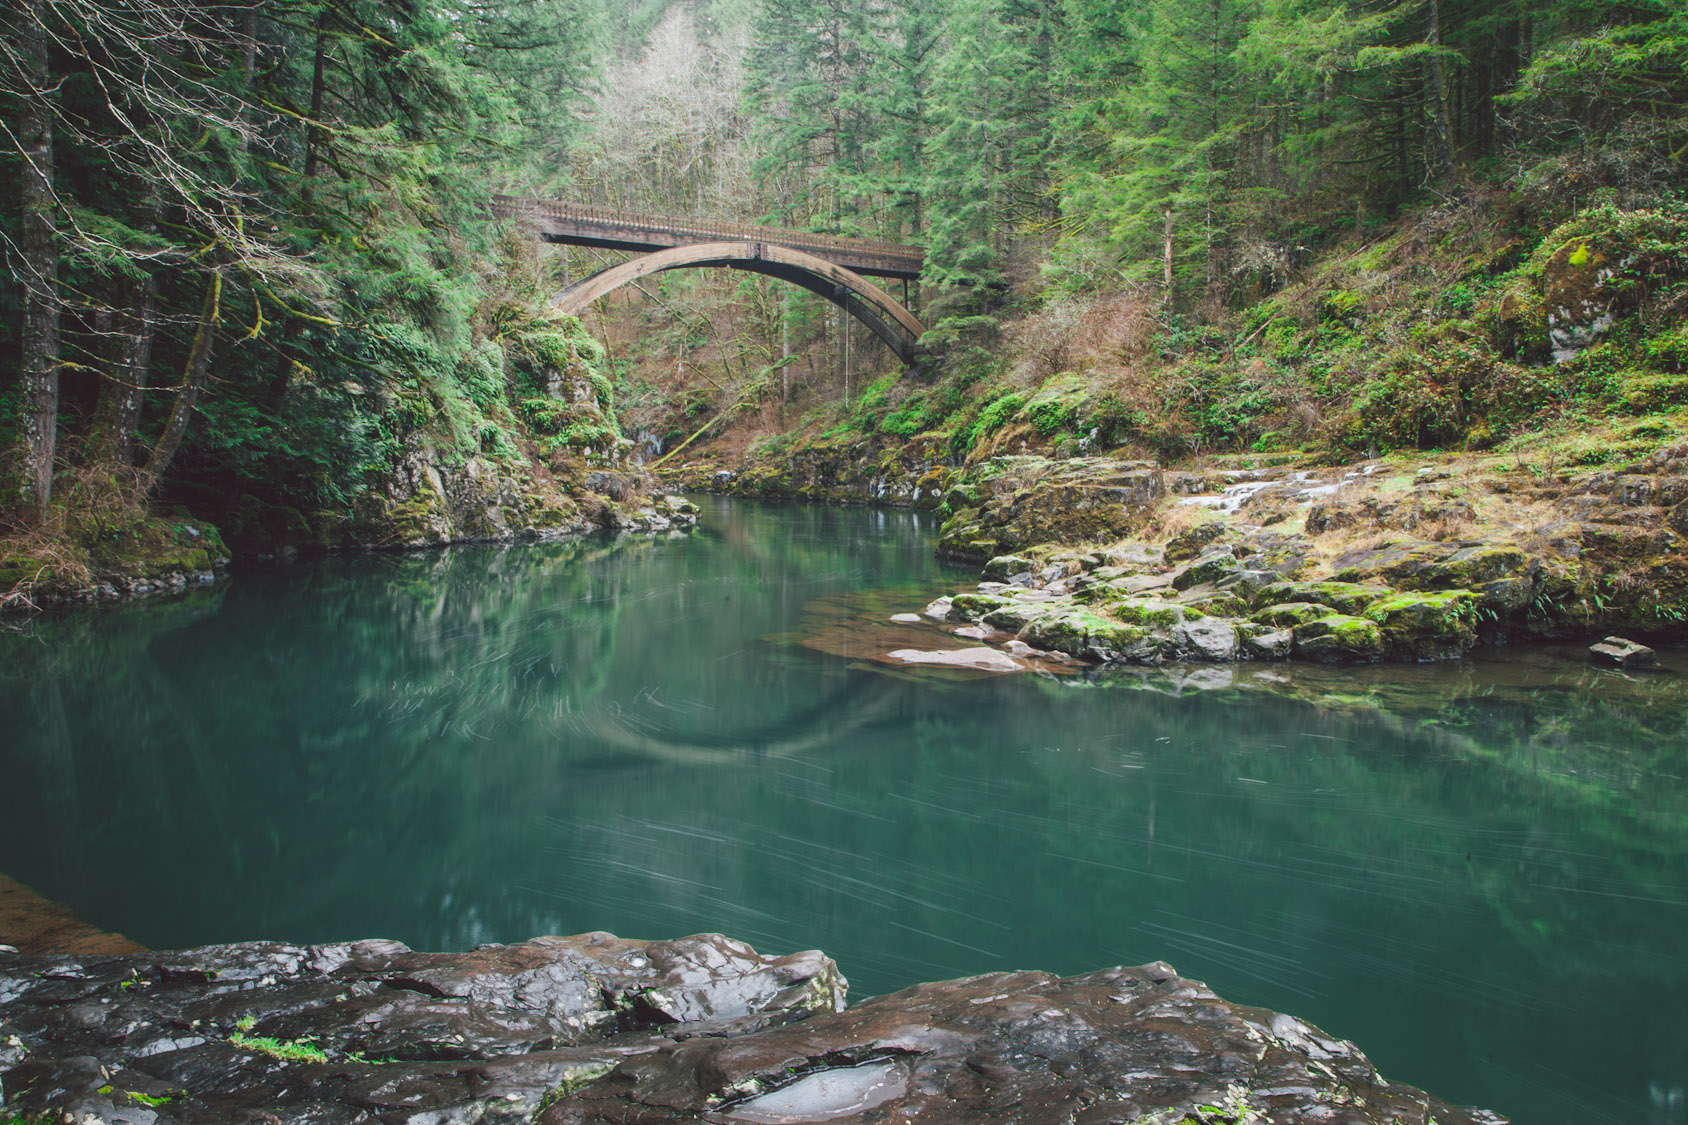 moultonfalls_bridge (1 of 1)